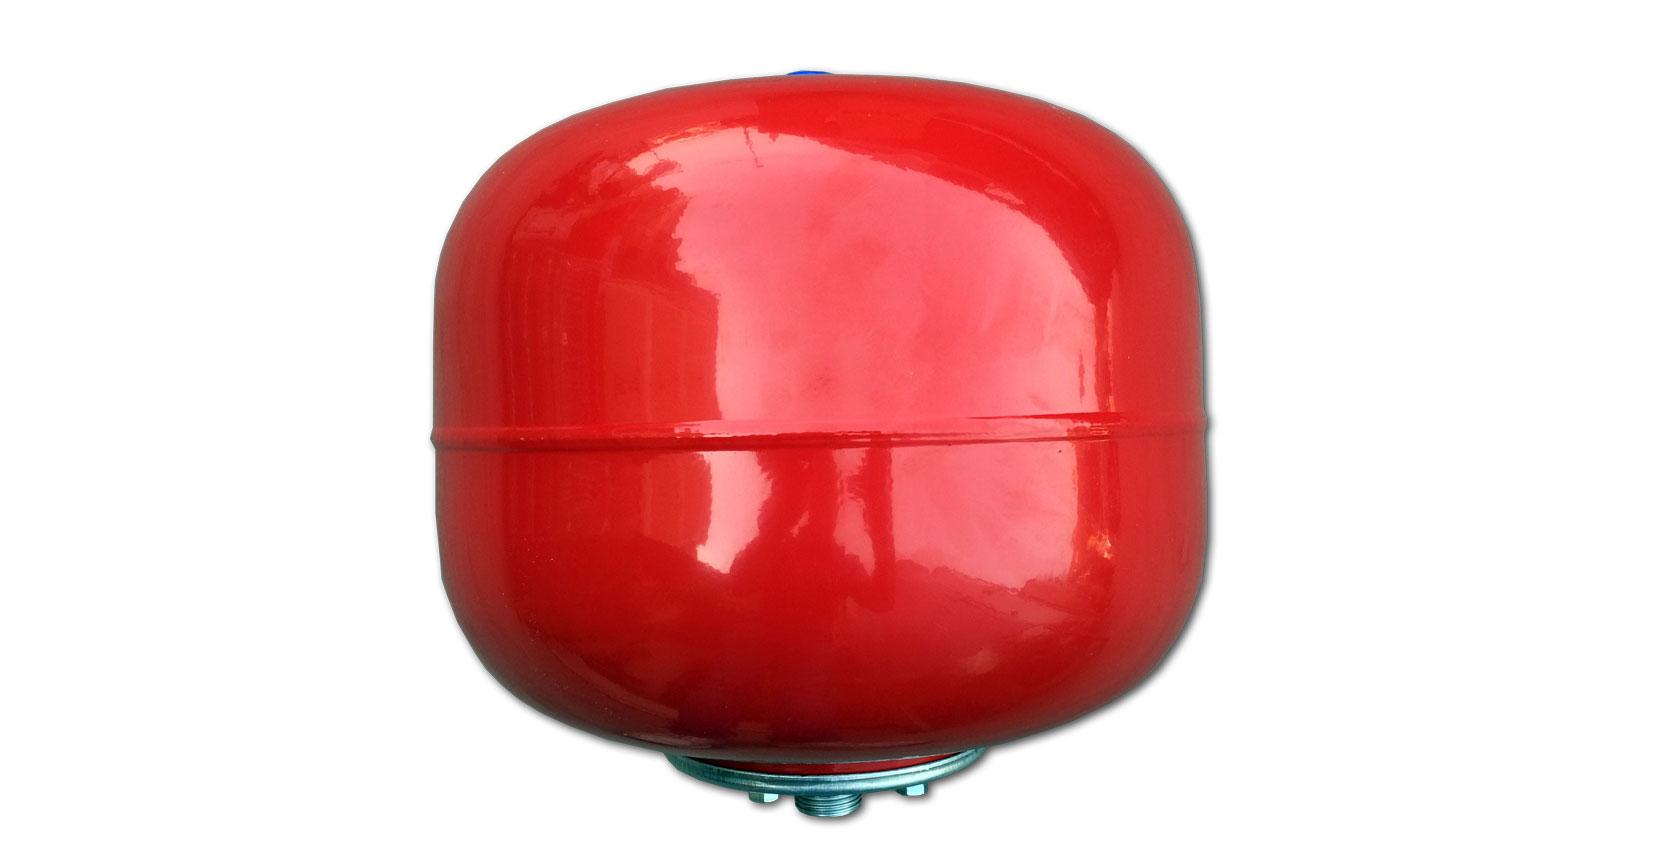 Vaso espansione autoclave membrana 24 lt varem ebay for Vasi espansione varem